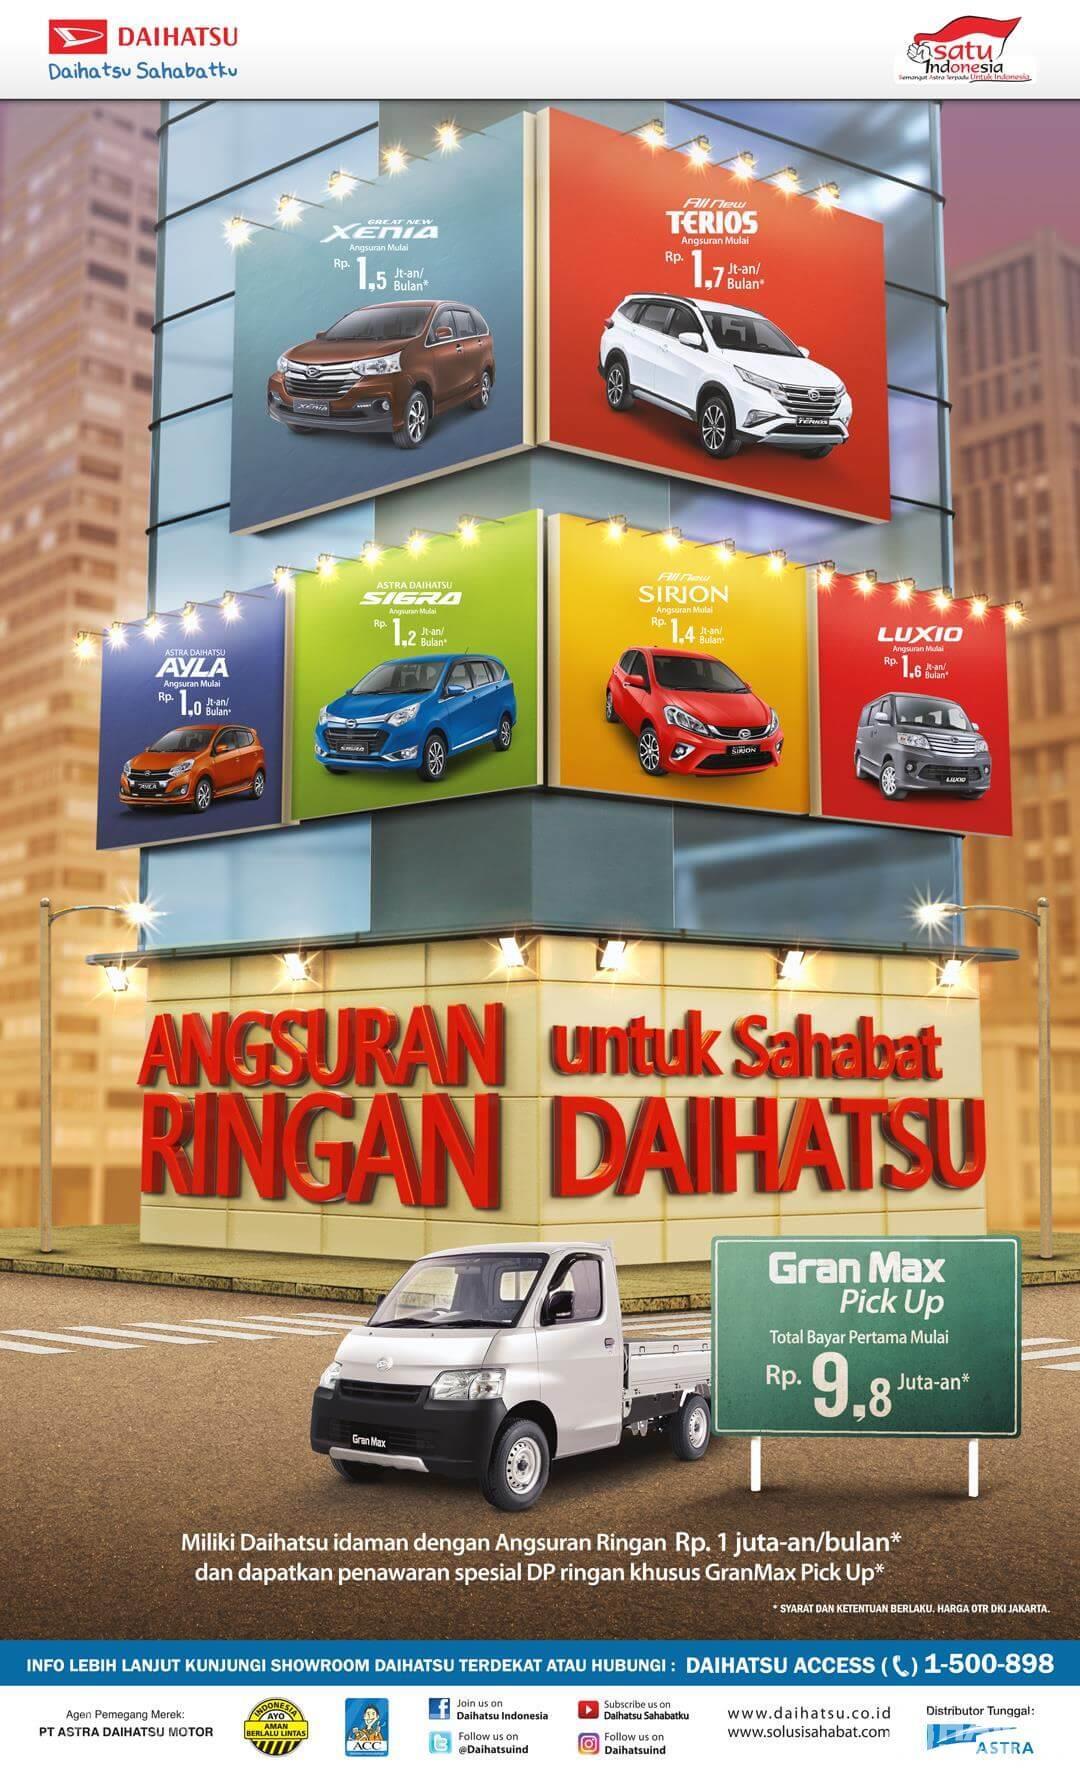 Gambar ini menunjukkan selebaran mengenai promo mobil besutan daihatsu